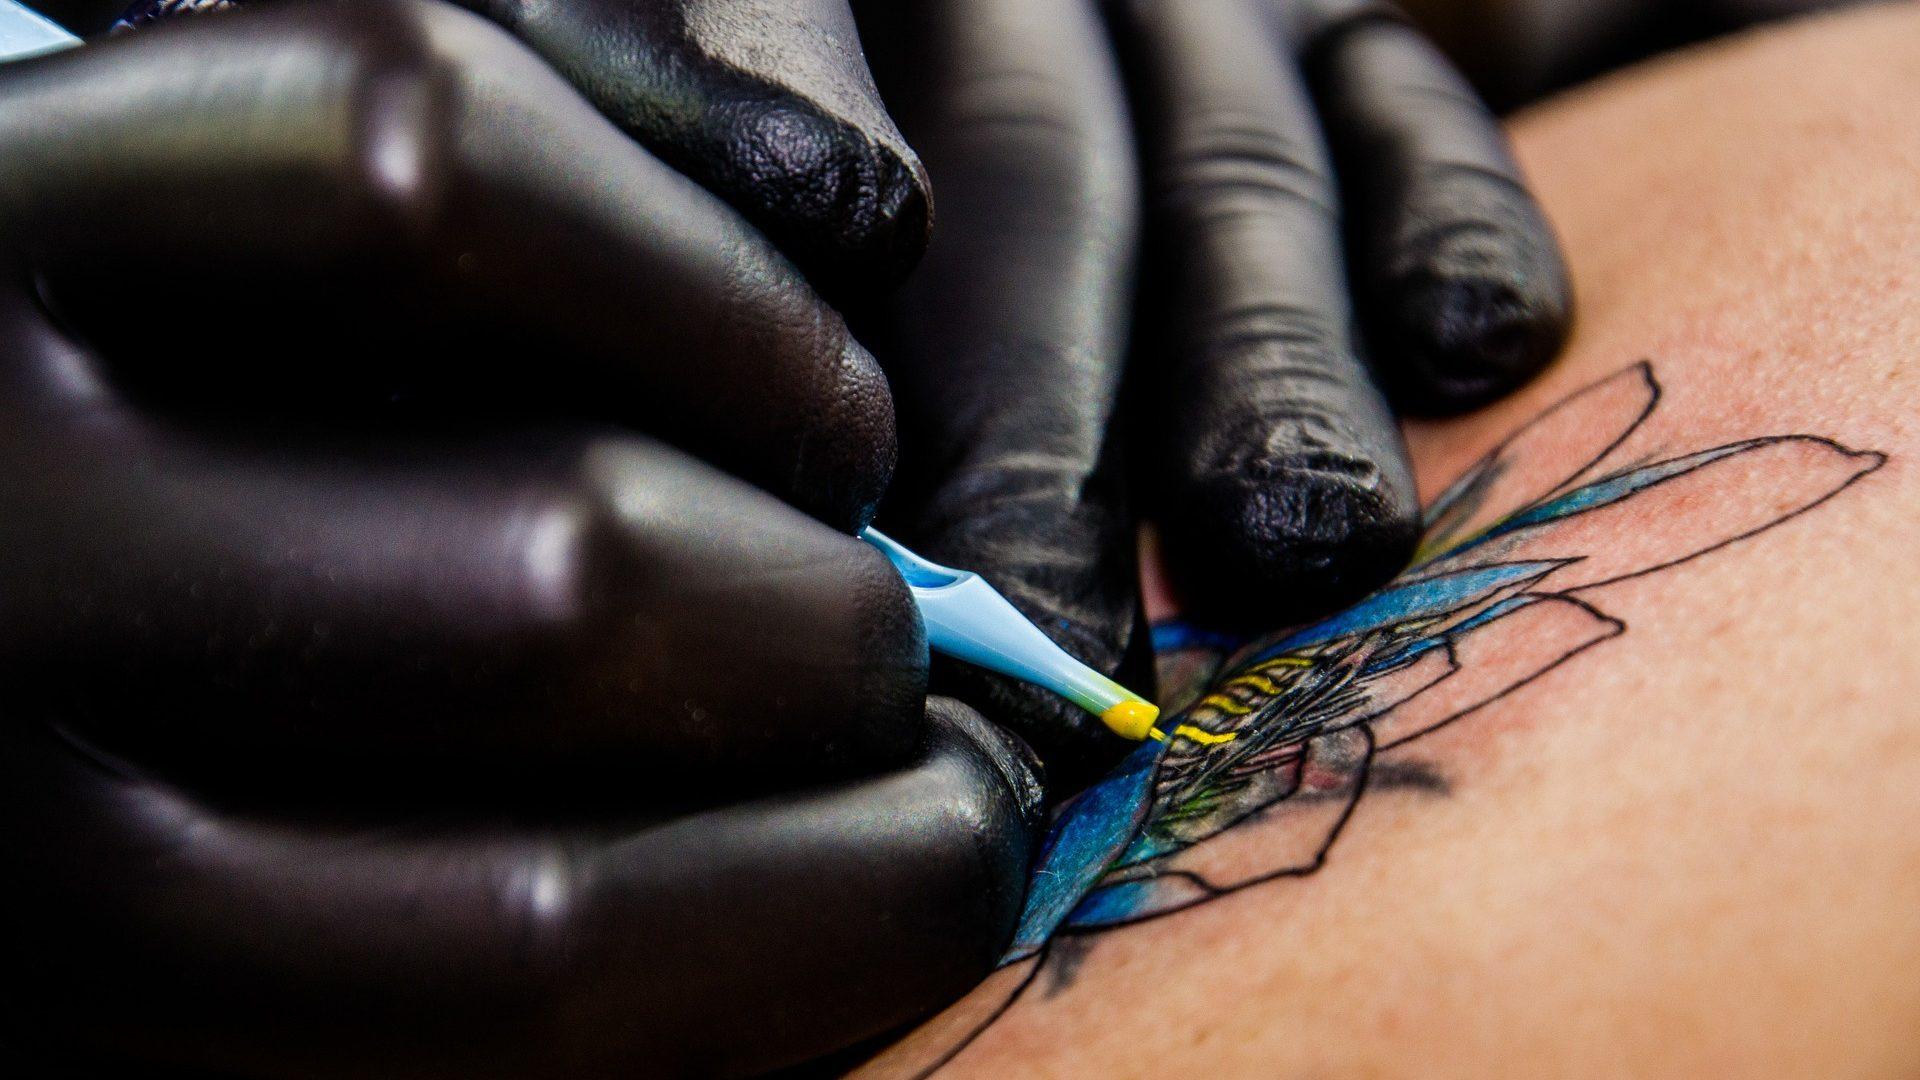 Image: Tattoo artist tattooing a flower